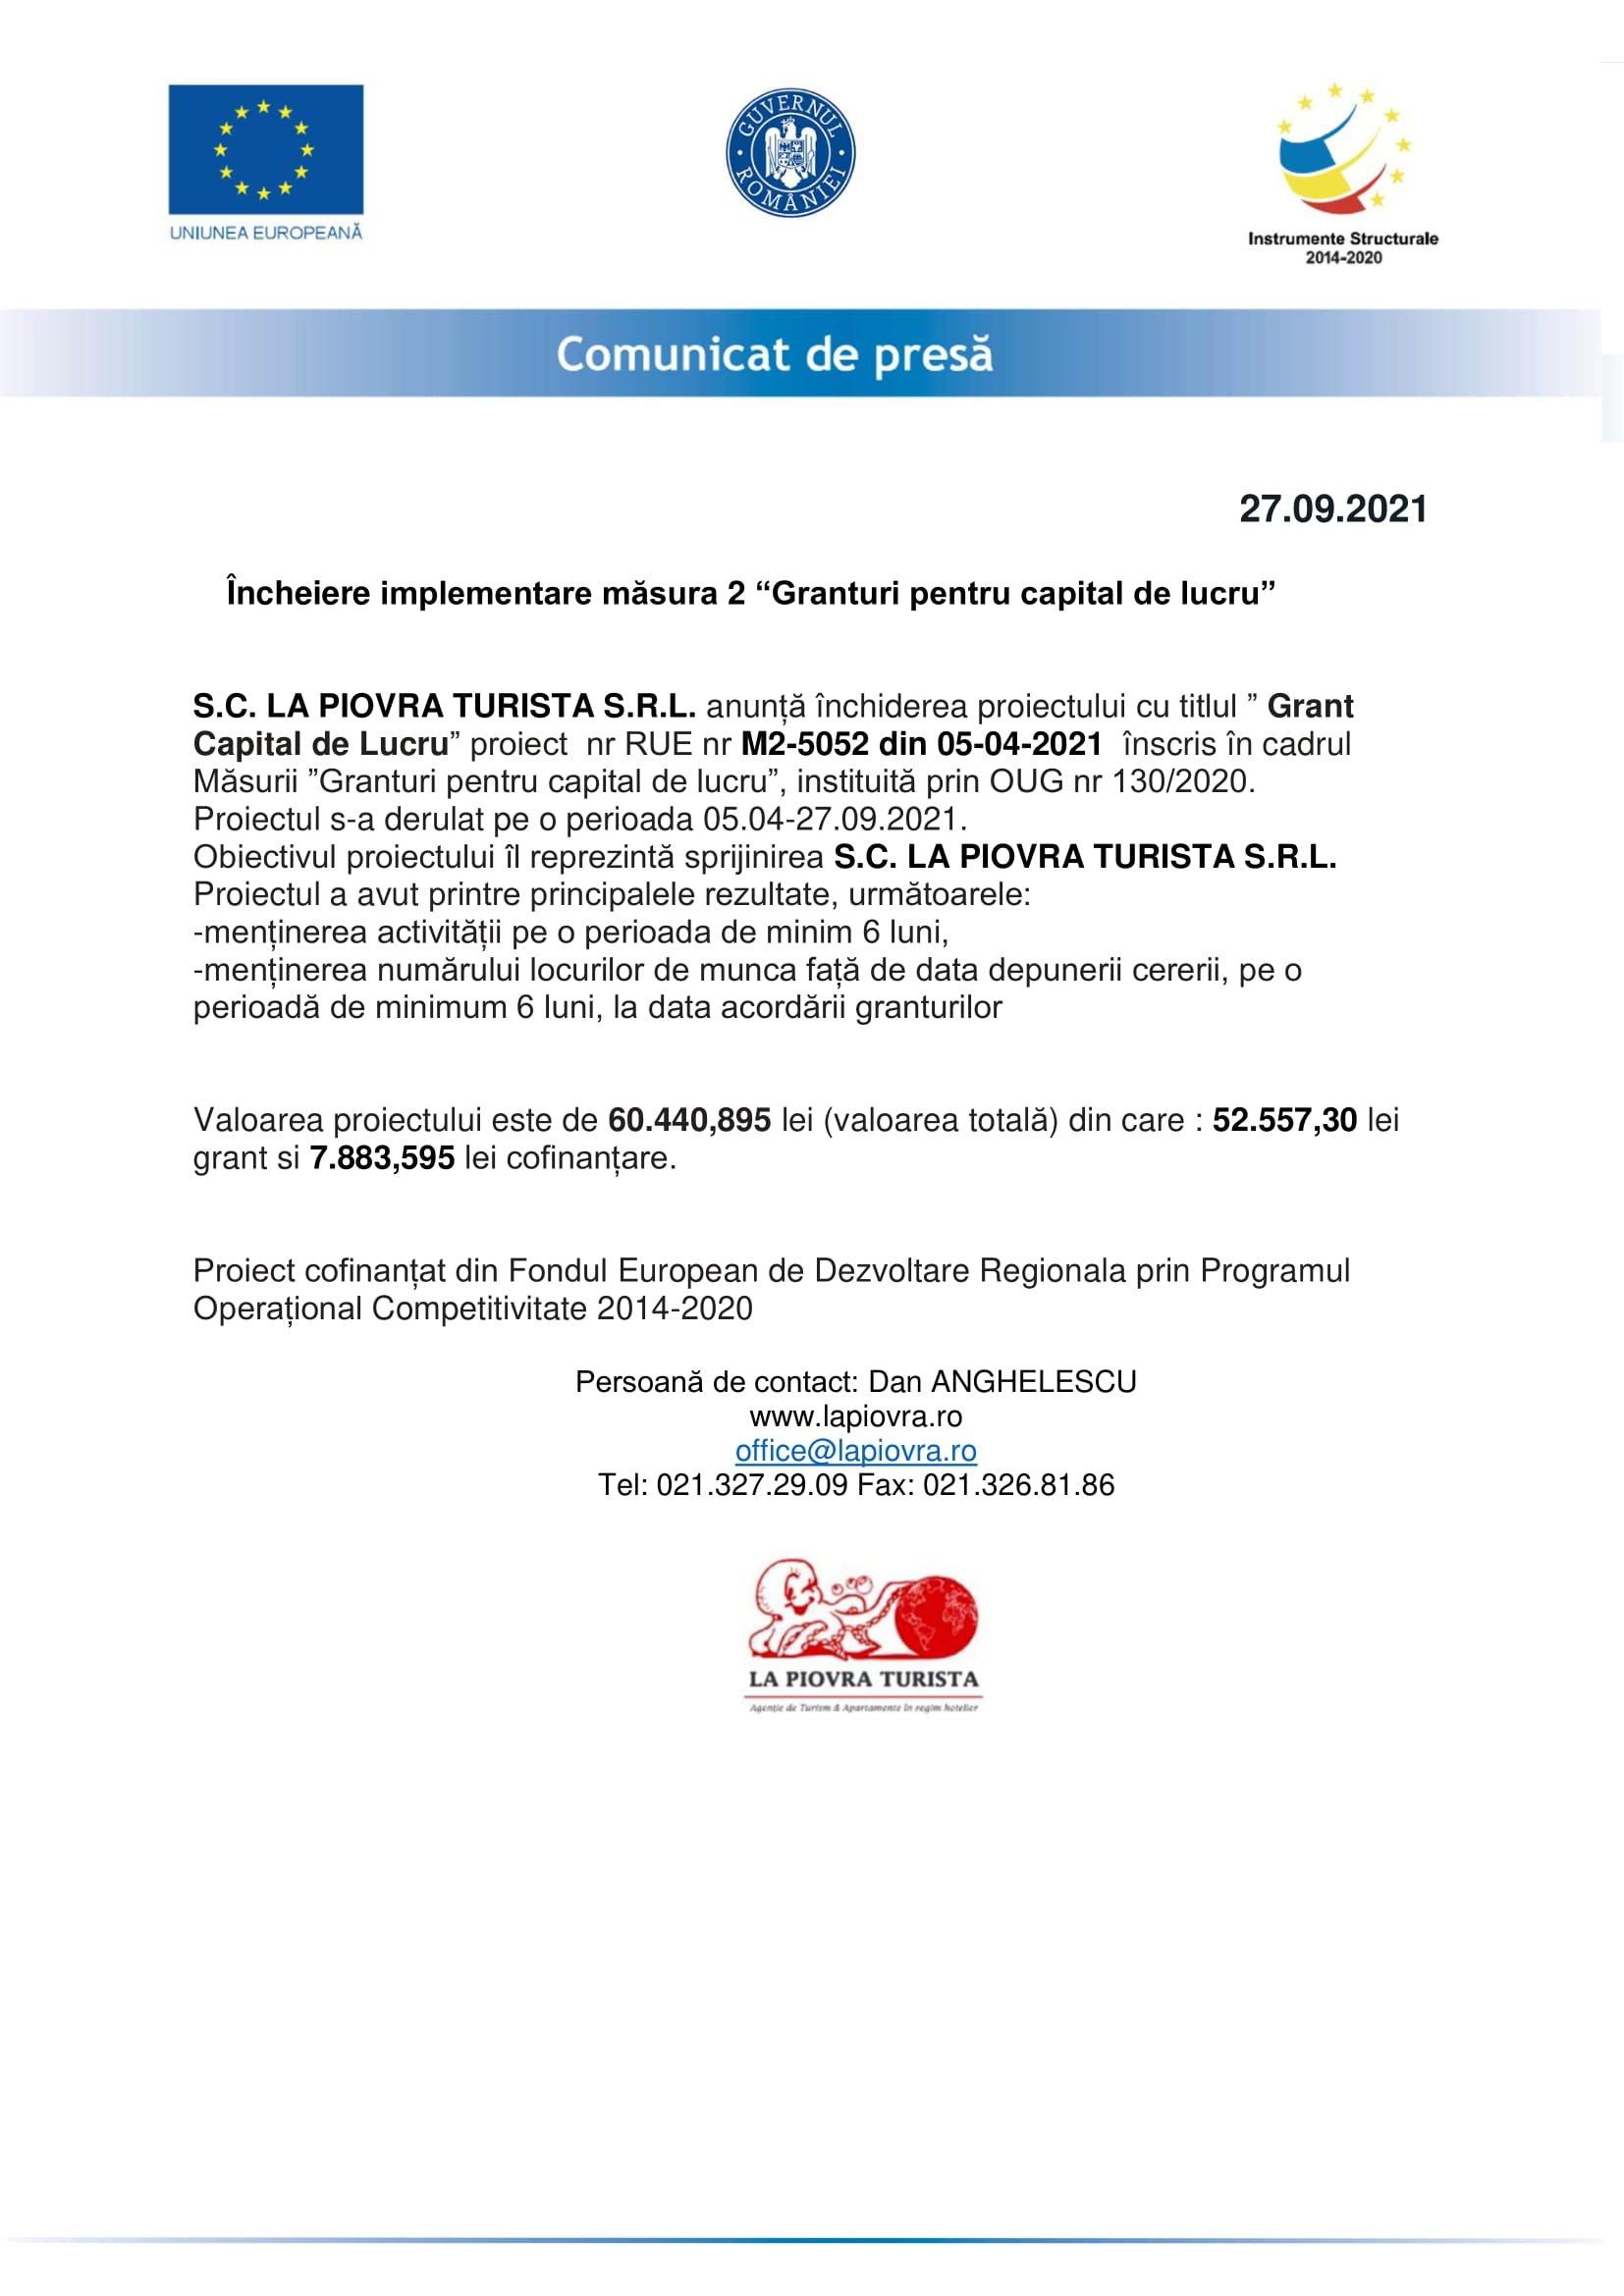 Comunicat masura 2 SC La Piovra Turista SRL.jpg